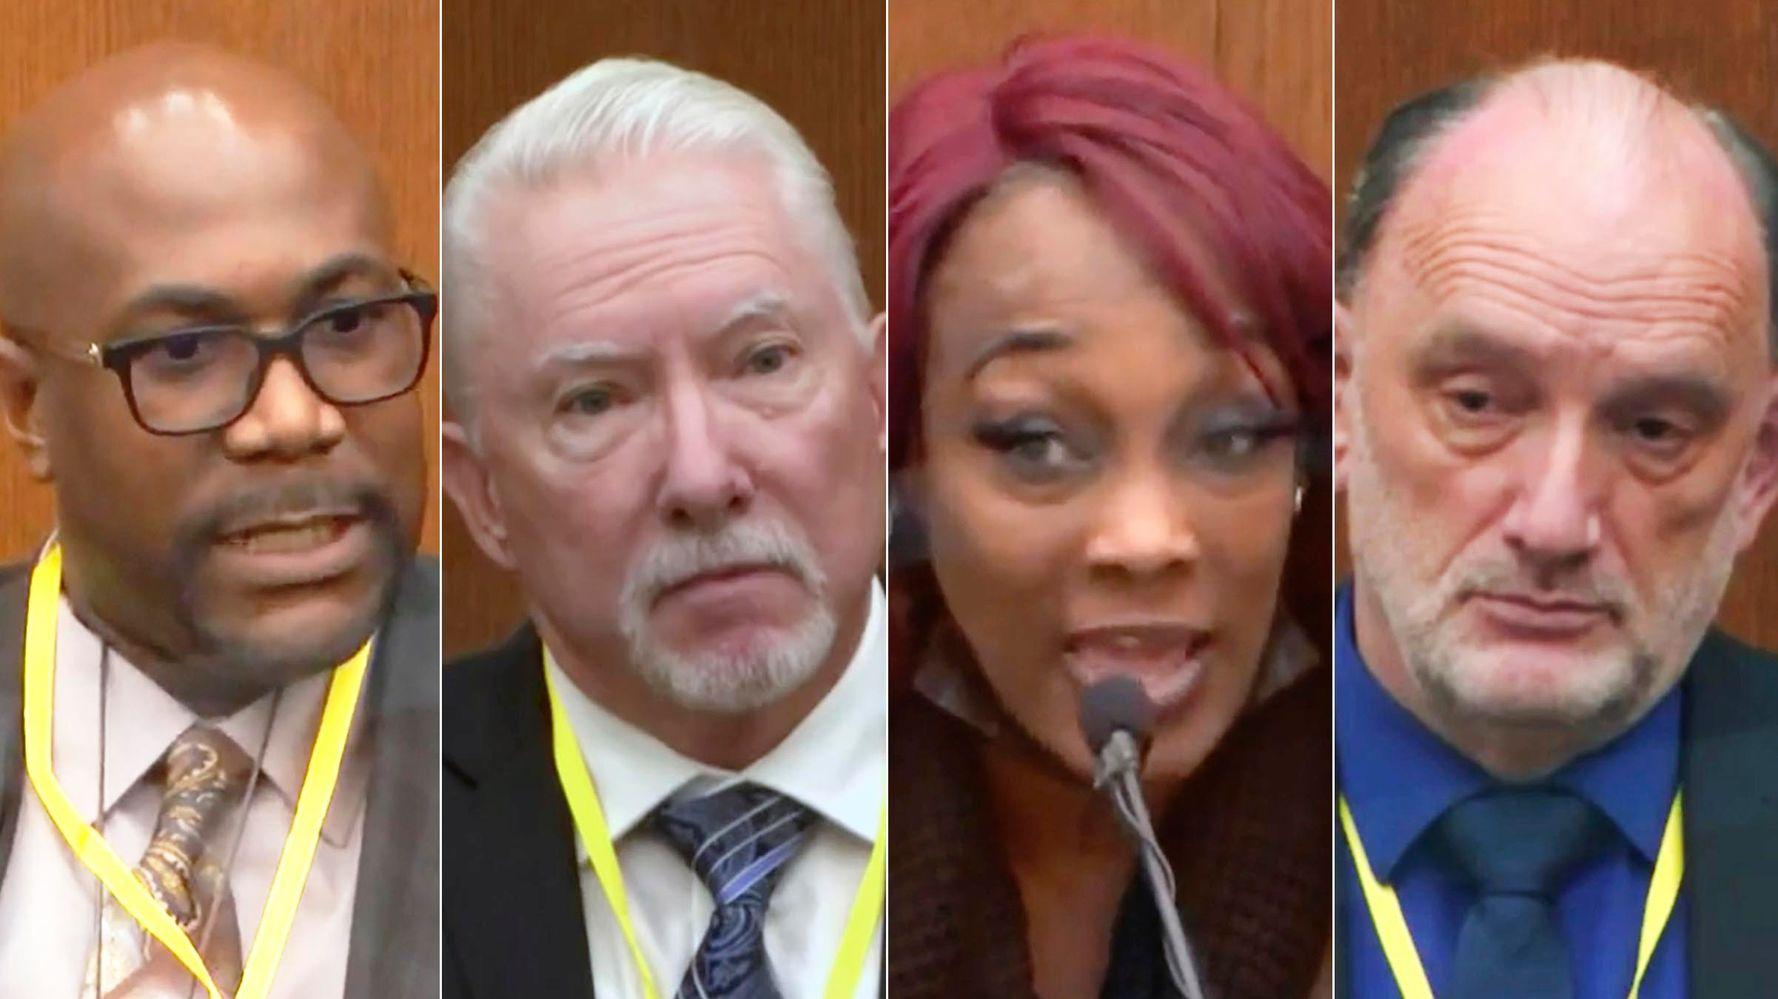 Derek Chauvin Trial: 4 Major Takeaways From The Final Week Of Testimony